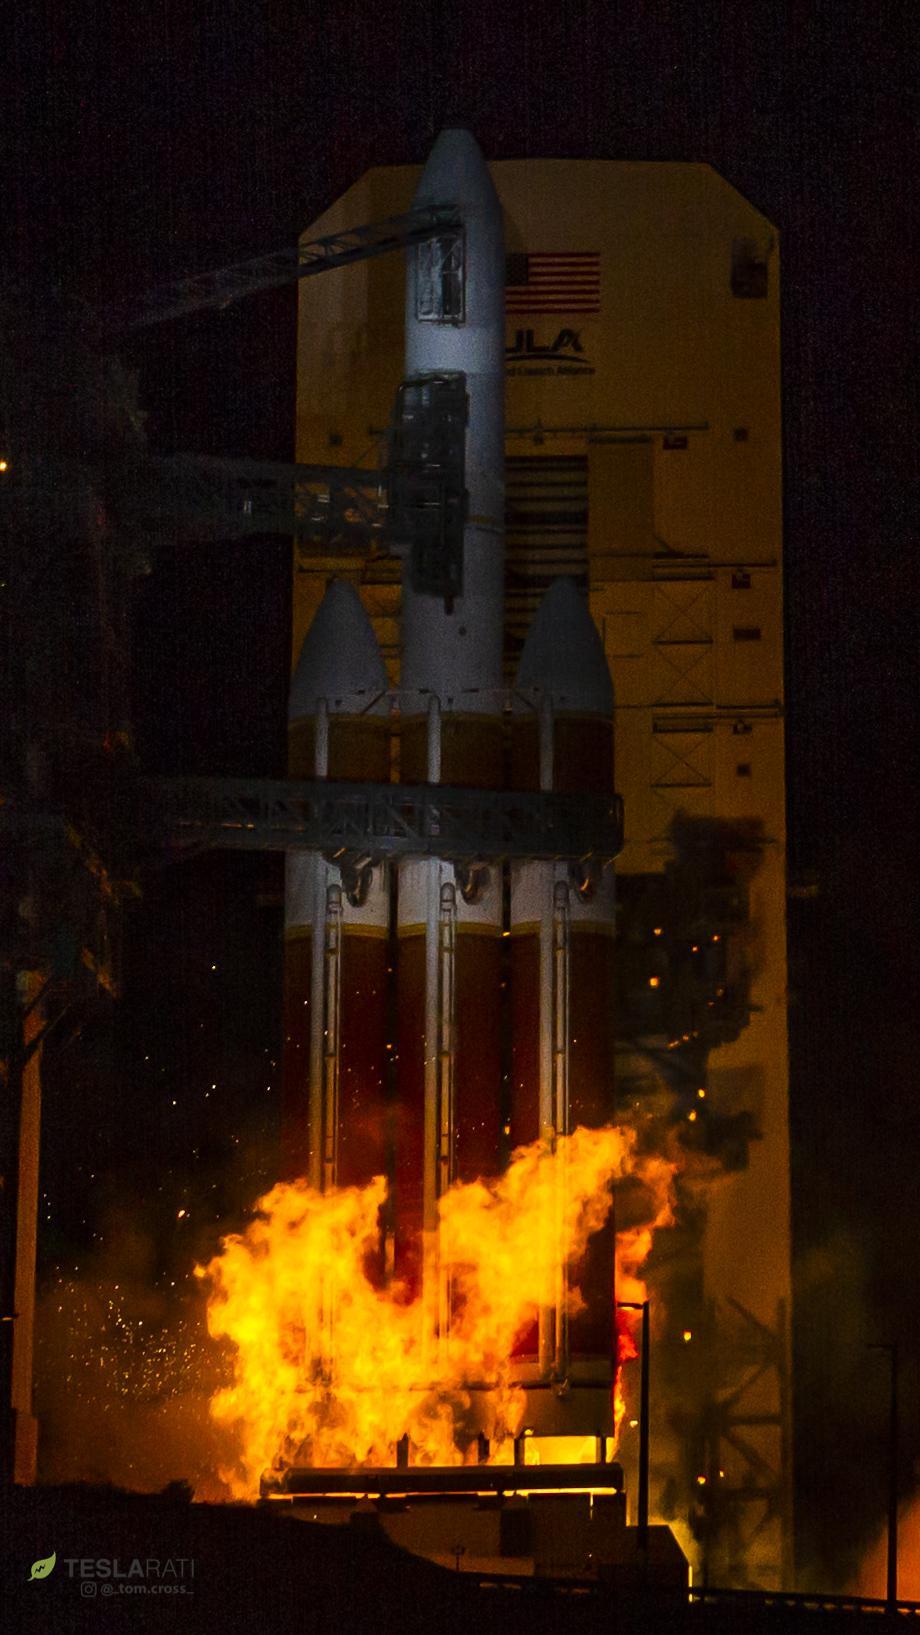 Delta IV Heavy PSP launch (Tom Cross) 1